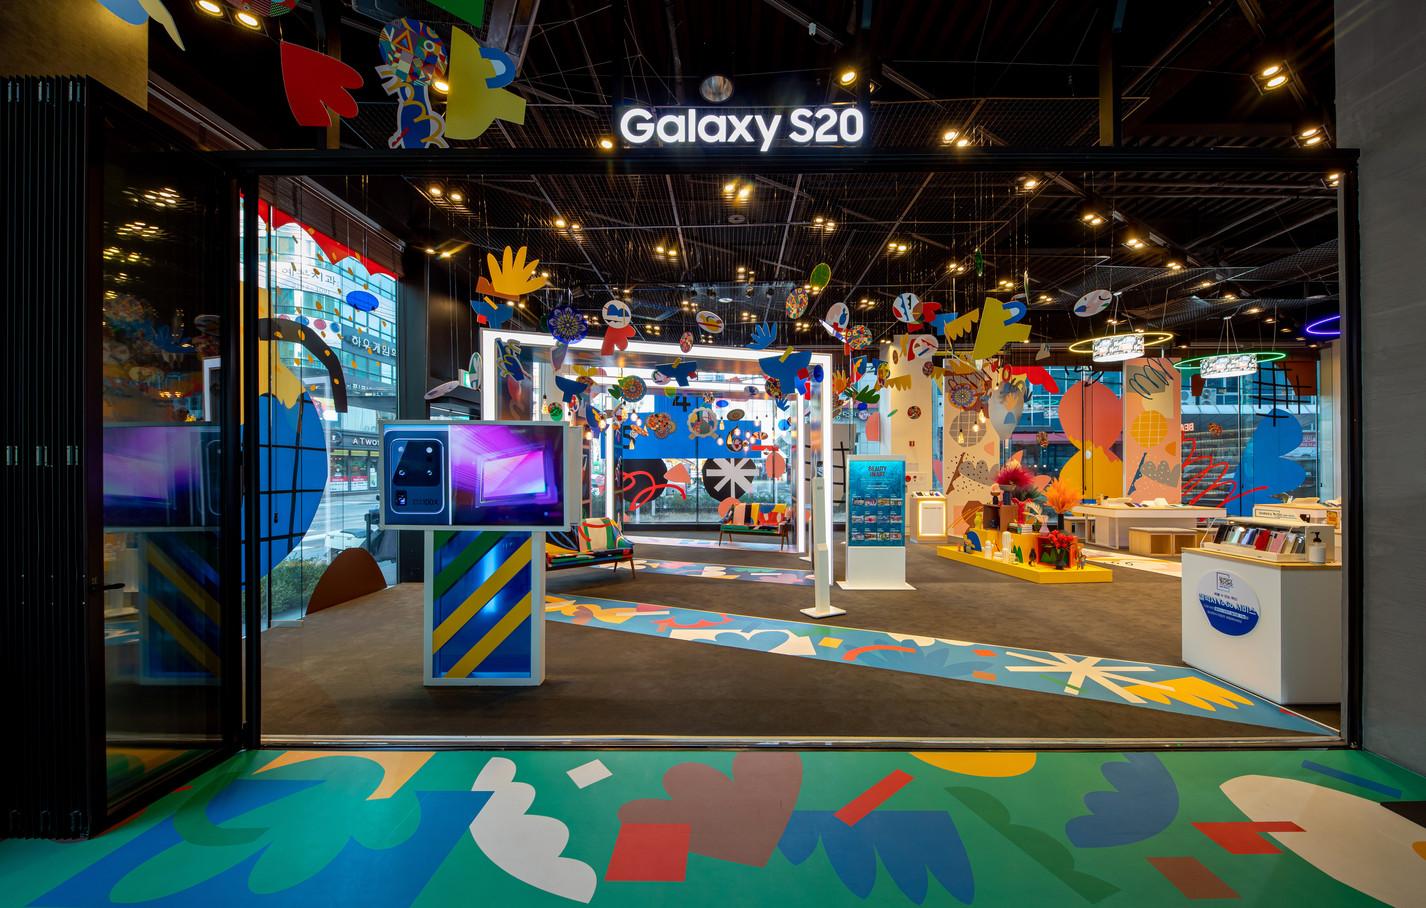 Galaxy S20 Studio